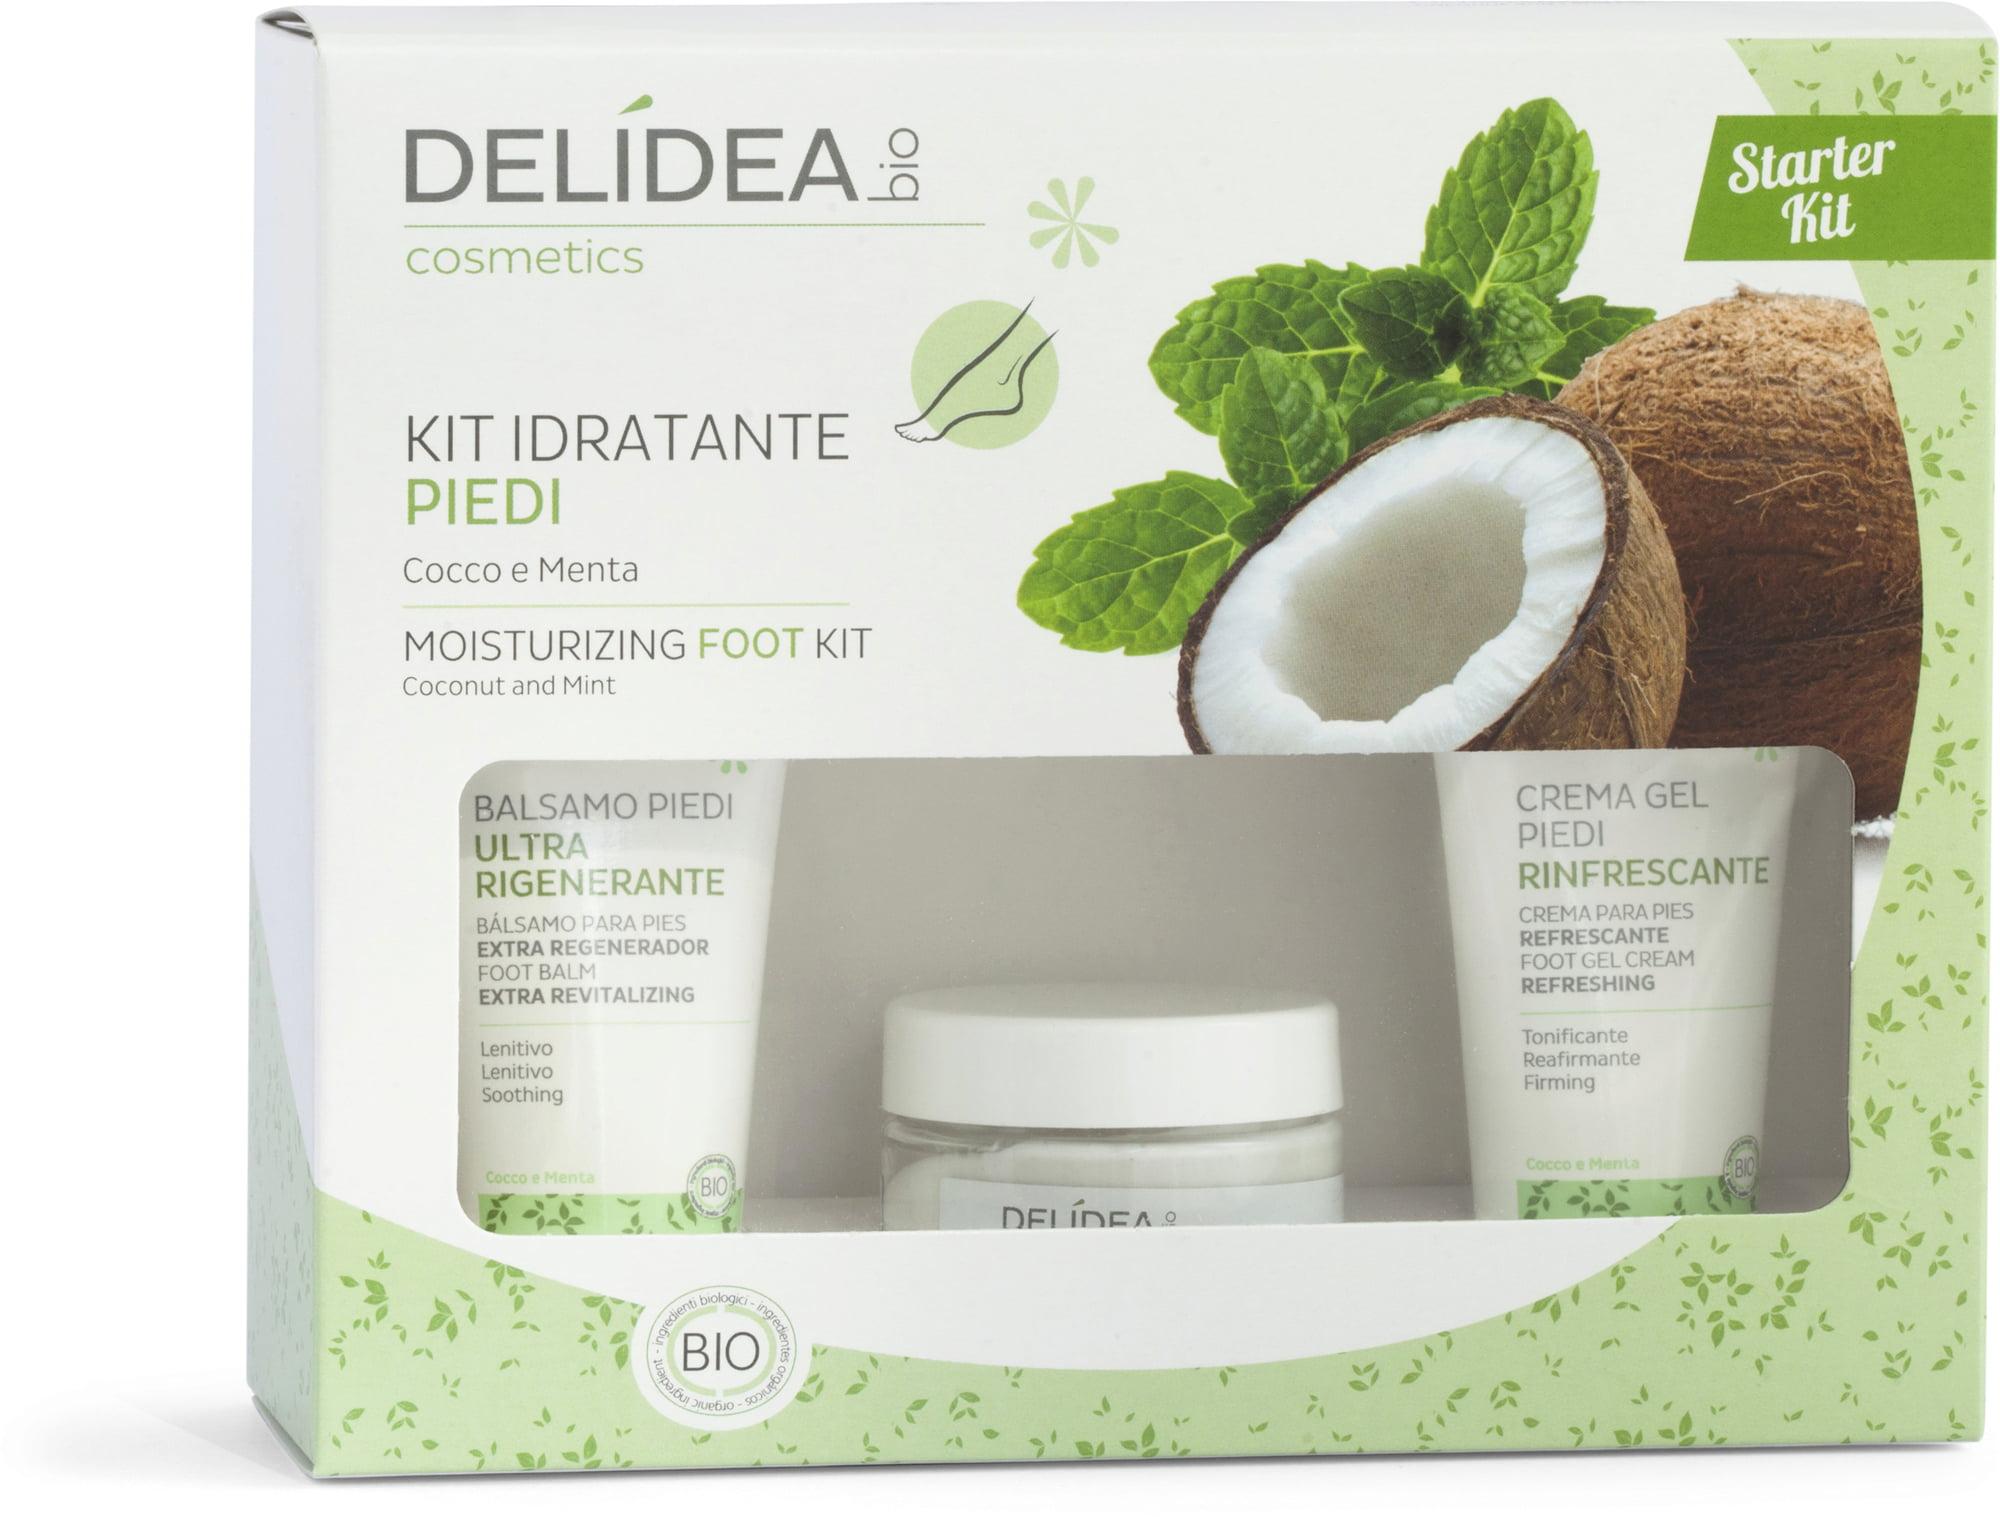 delidea4